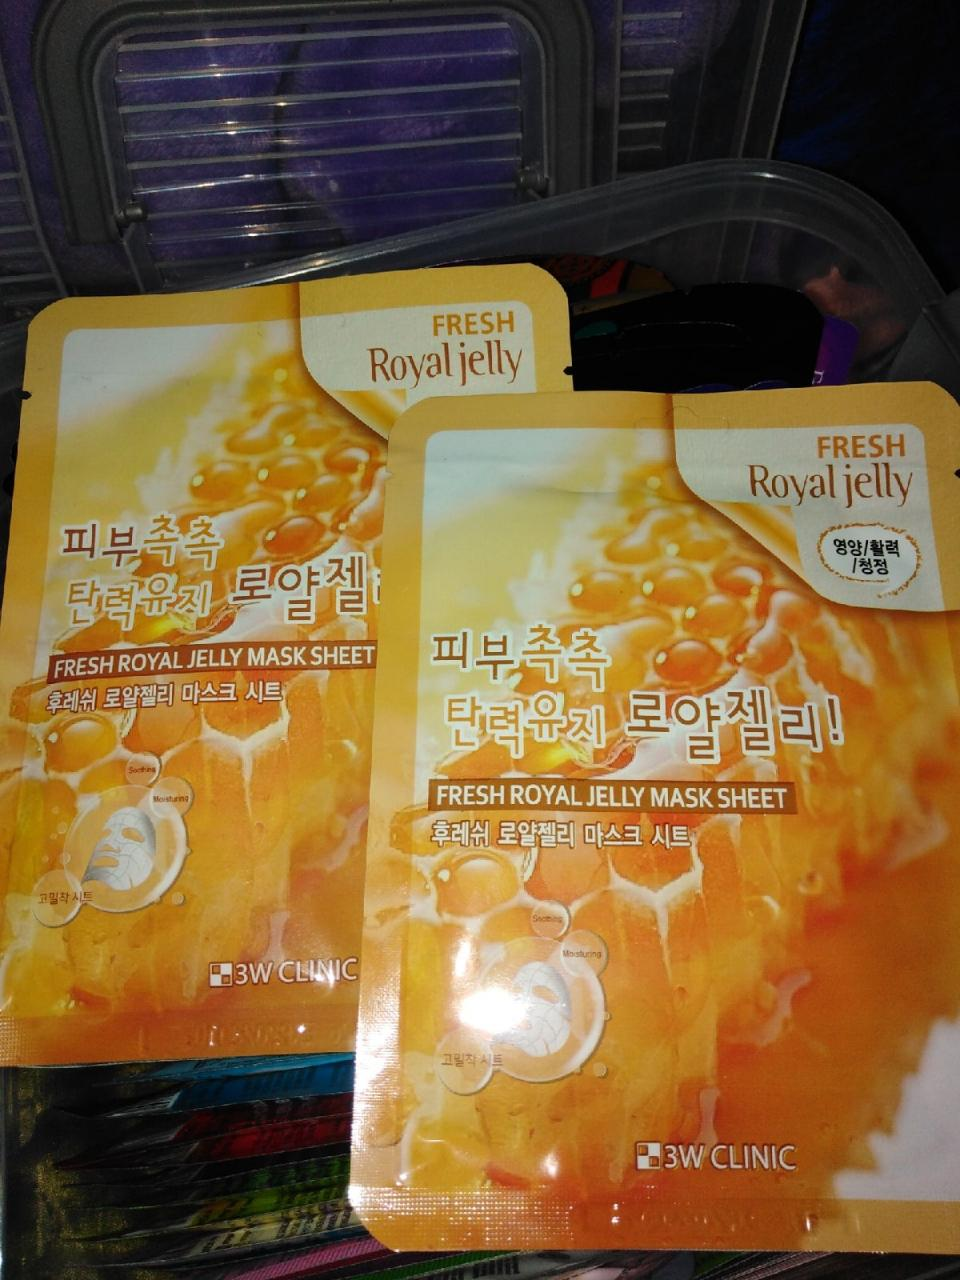 Отзыв на товар: Освежающая тканевая маска для лица с пчелиным молочком Fresh Royal Jelly Mask Sheet. 3W CLINIC. Вид 1 от 1619368596